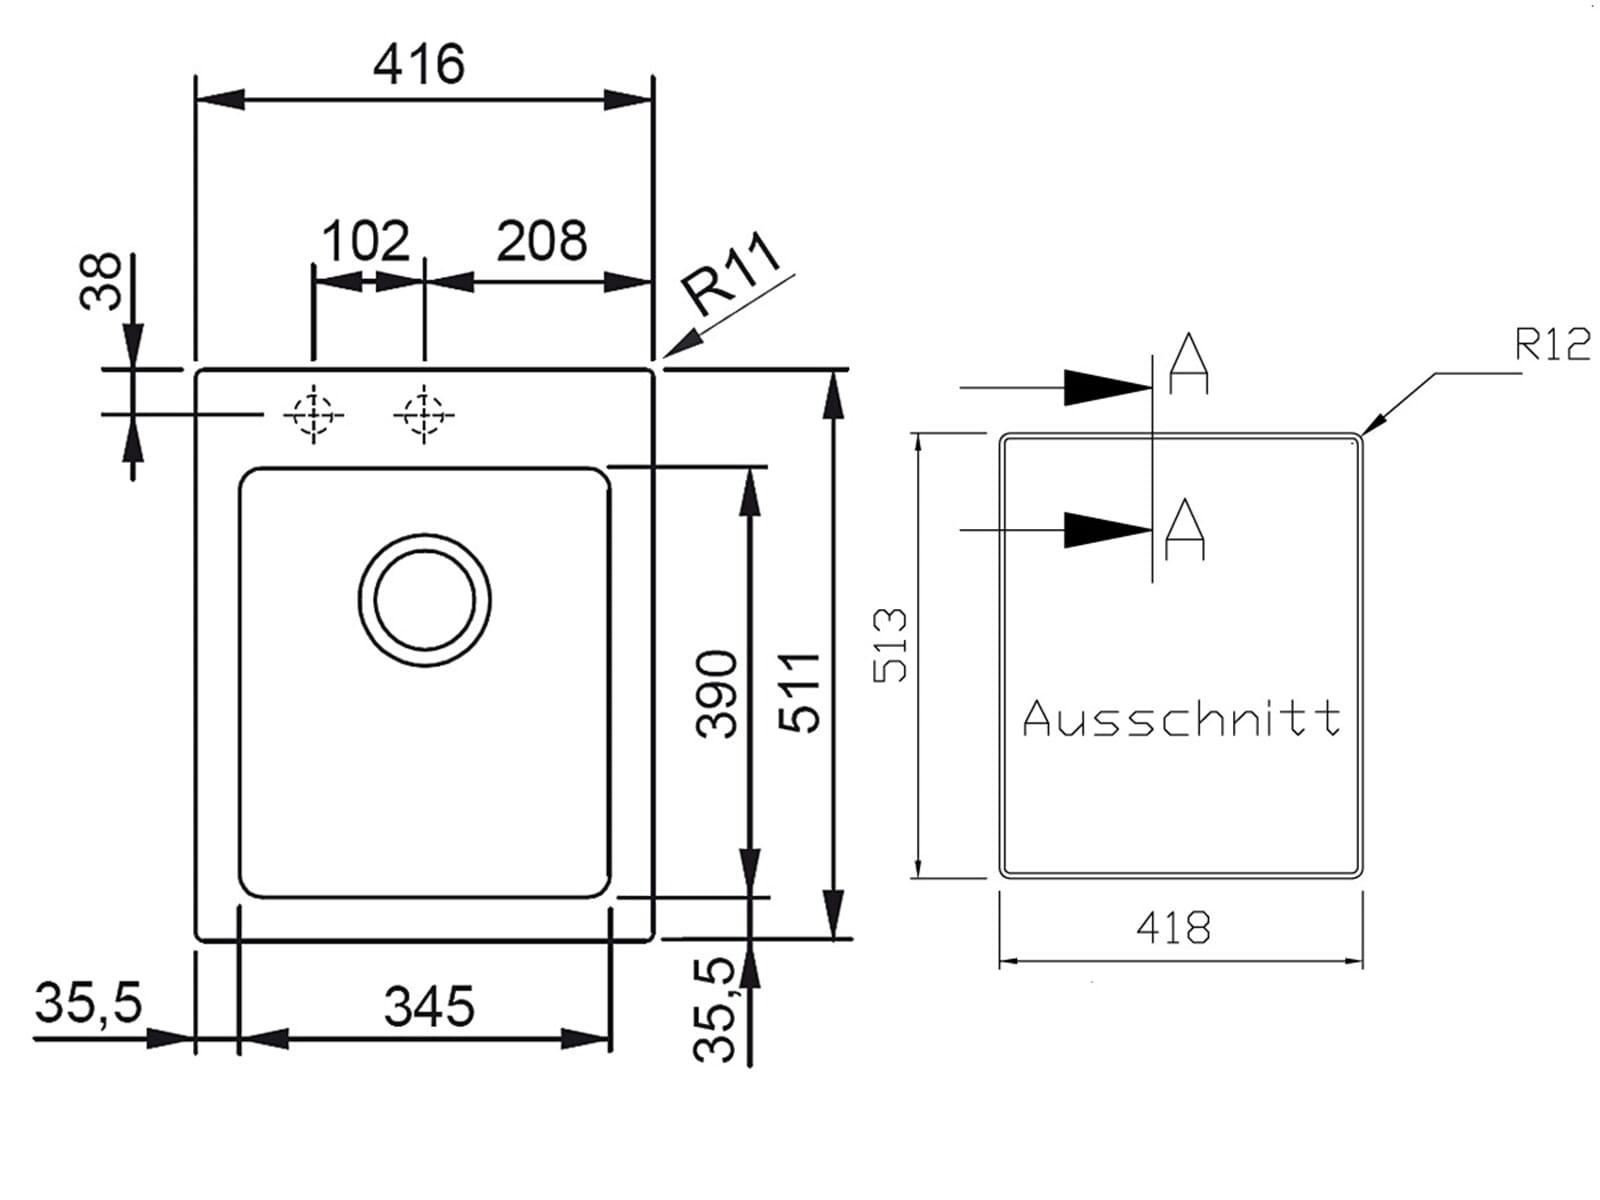 Franke Maris MRG 210-42 Onyx - 135.0339.202 Granitspüle